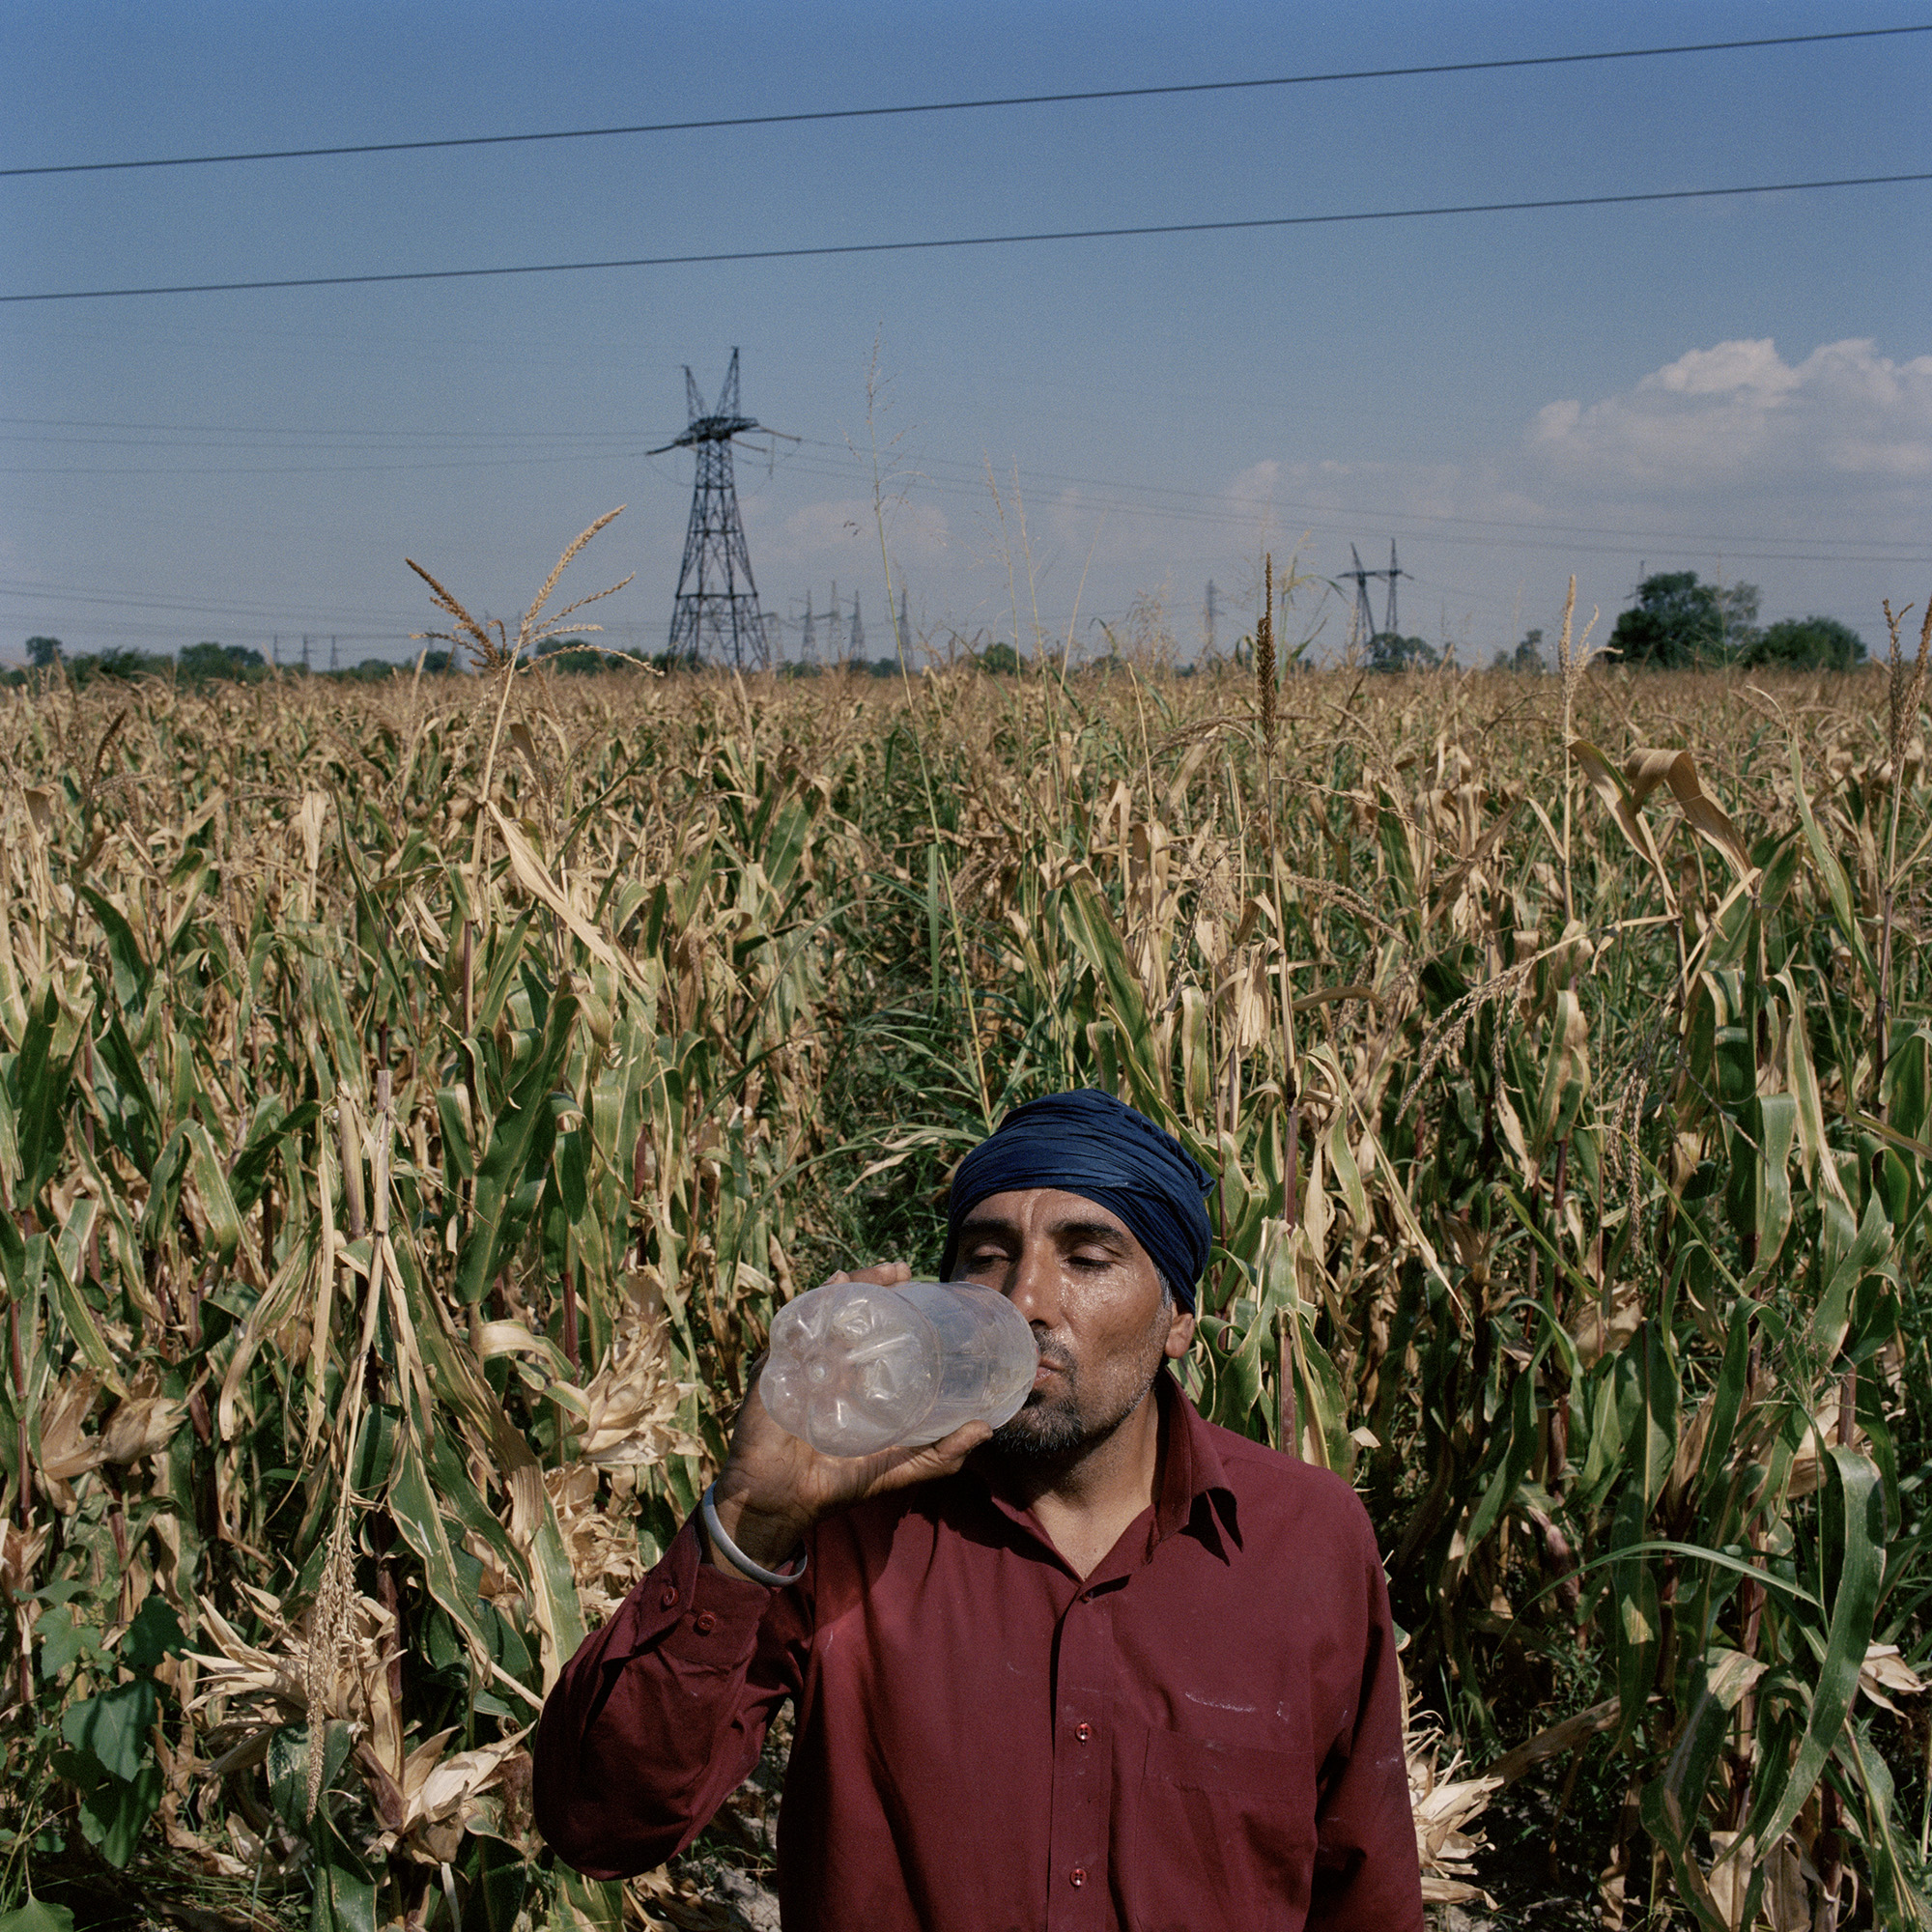 Sikh farmers_08.jpg